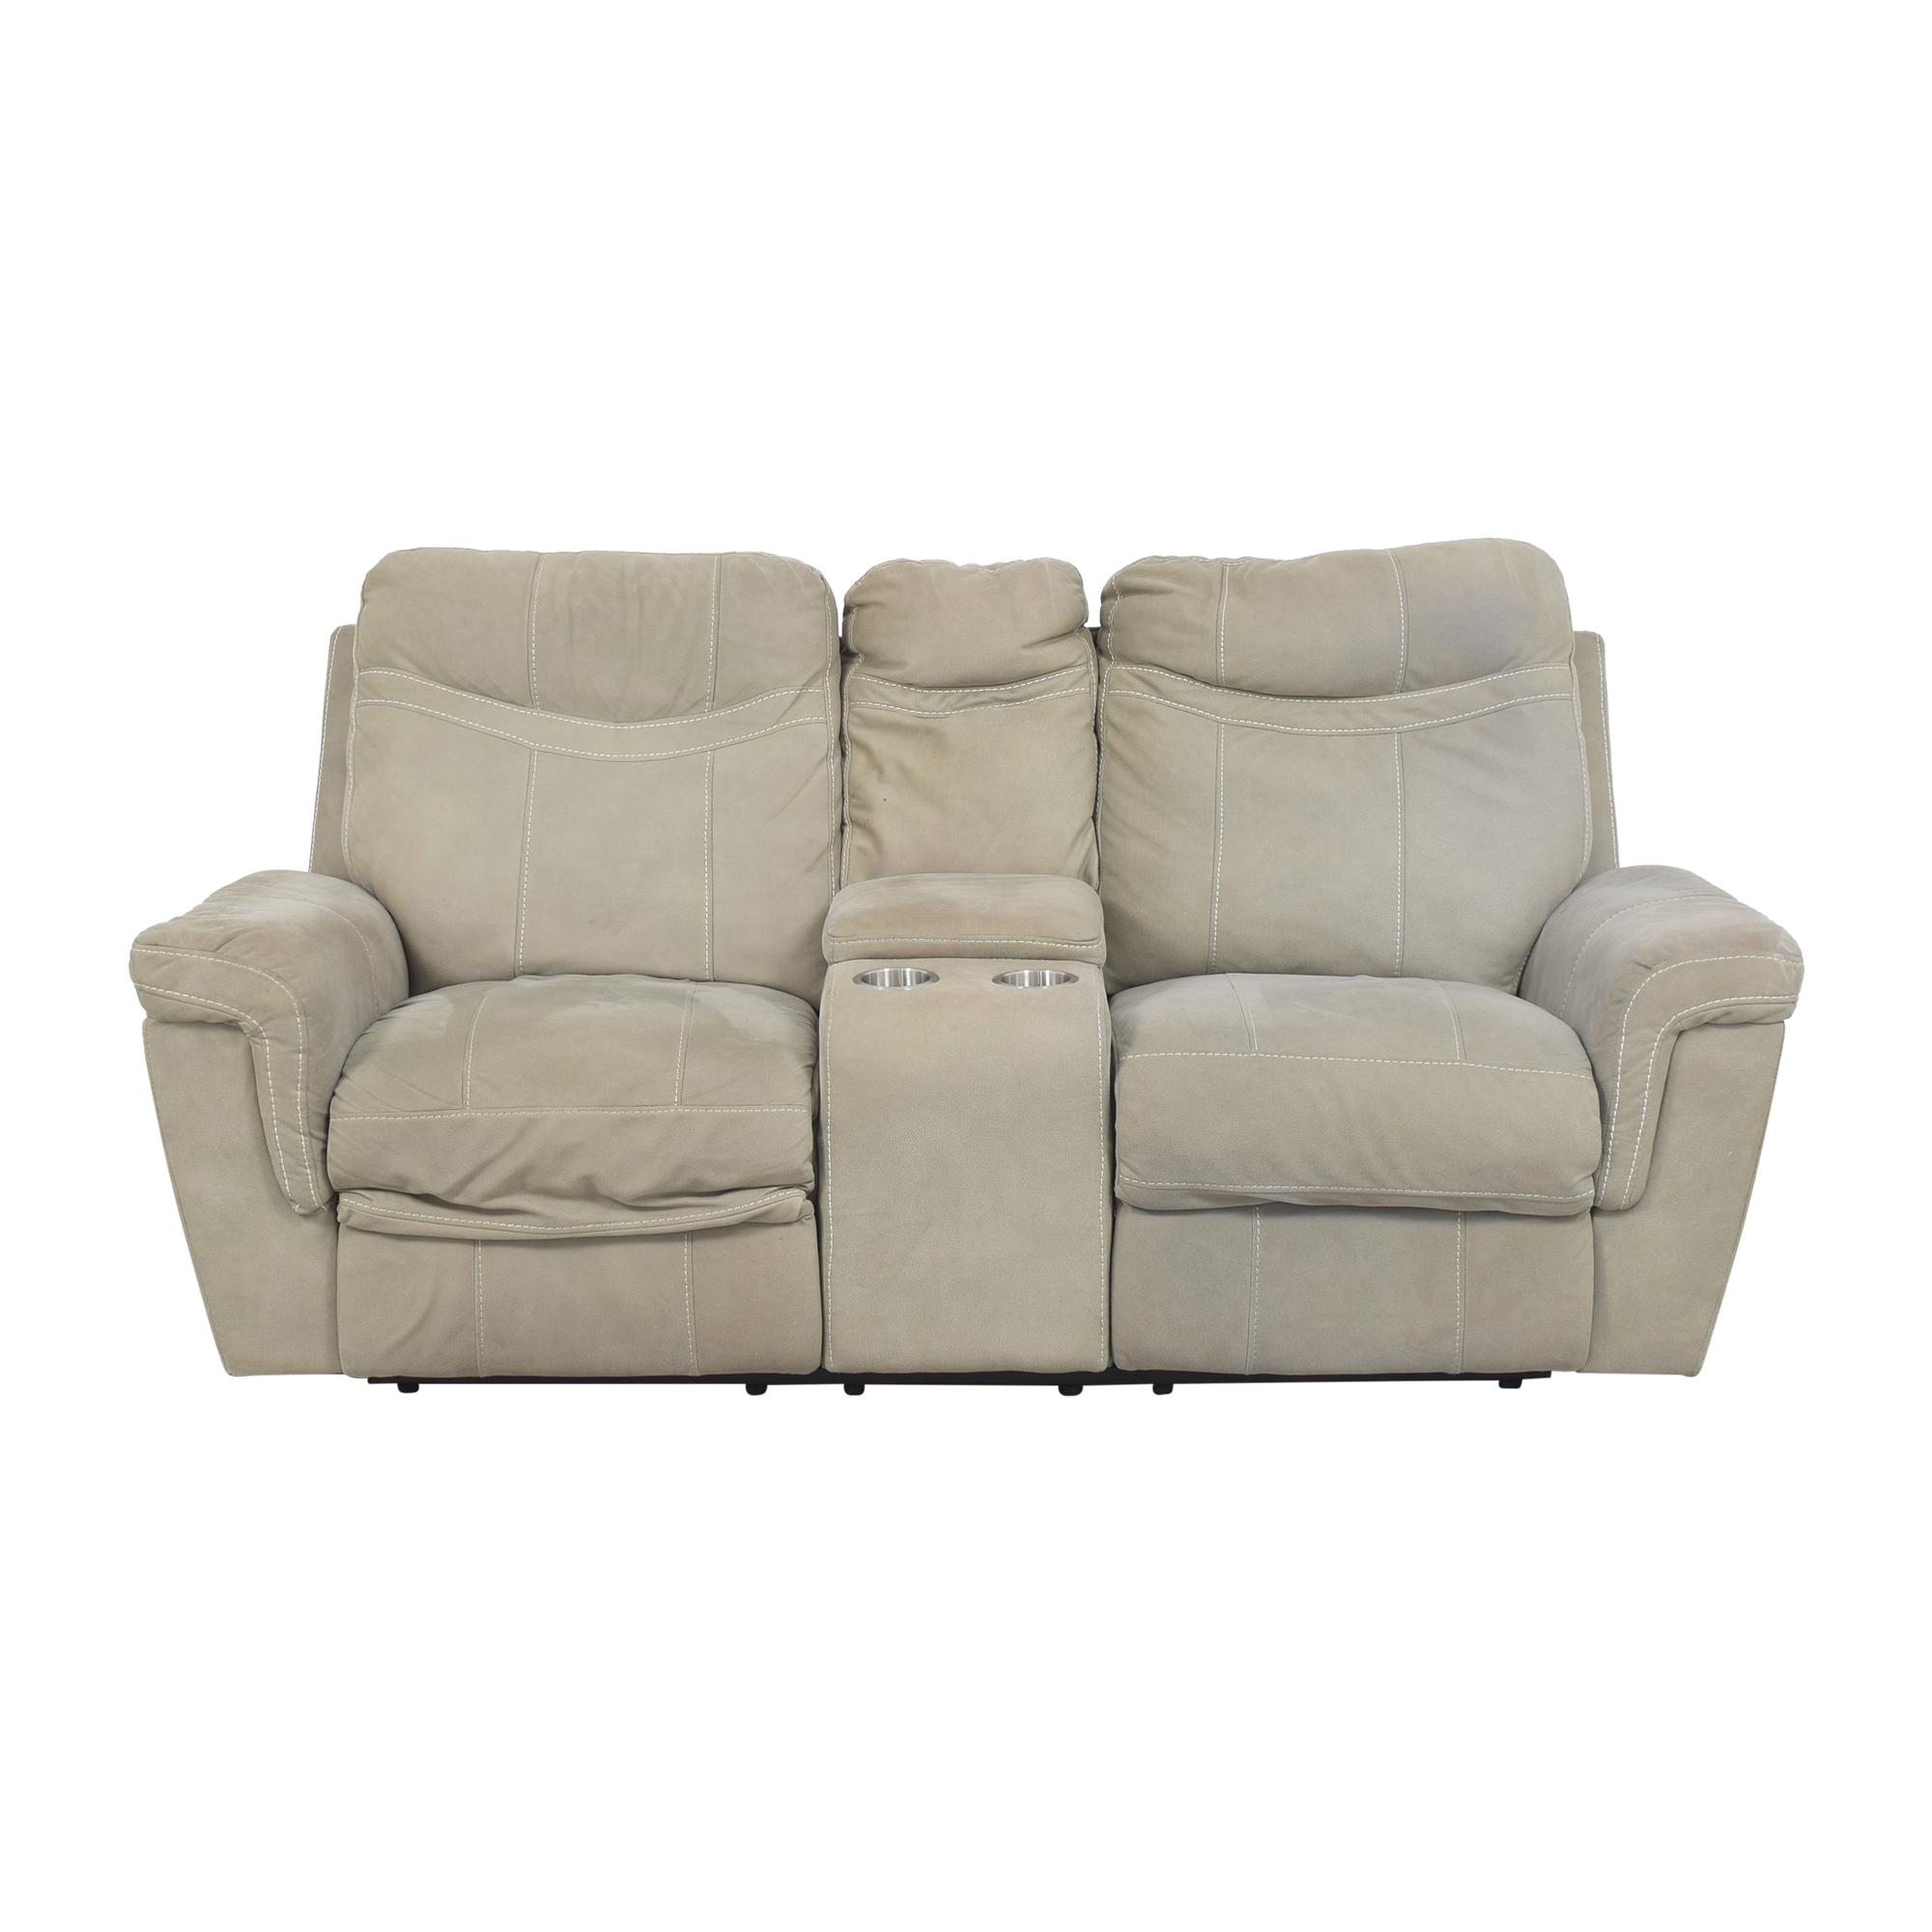 Standard Furniture Standard Furniture Power Reclining Sofa price